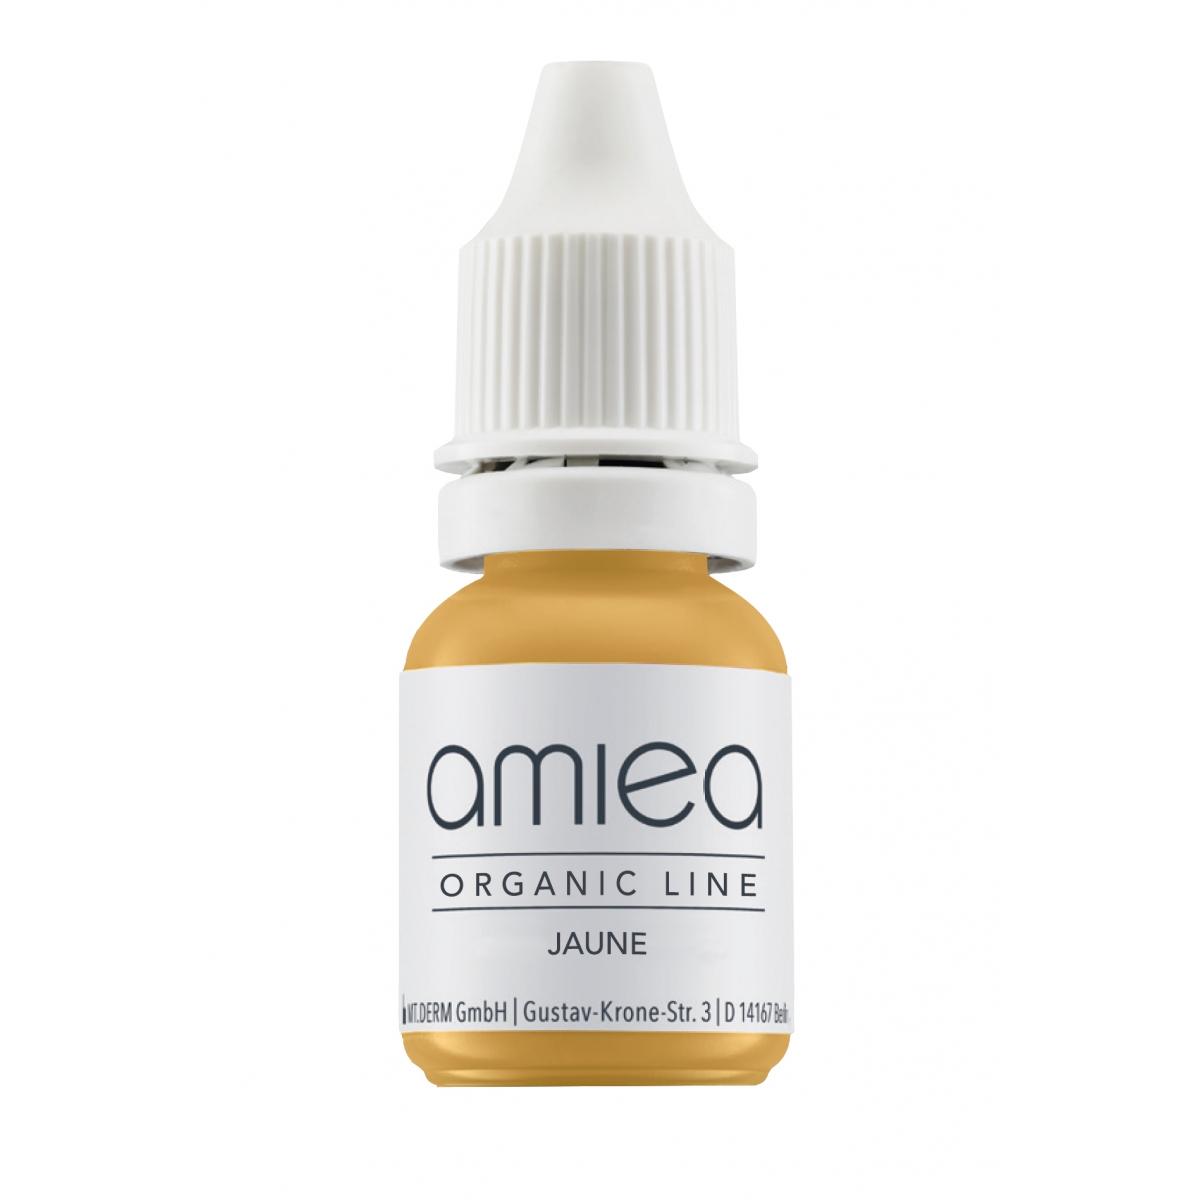 Organicline (5 ml)  - PIGMENTS AMIEA ORGANICLINE CORRECTEUR JAUNE, Flacon 5 ml